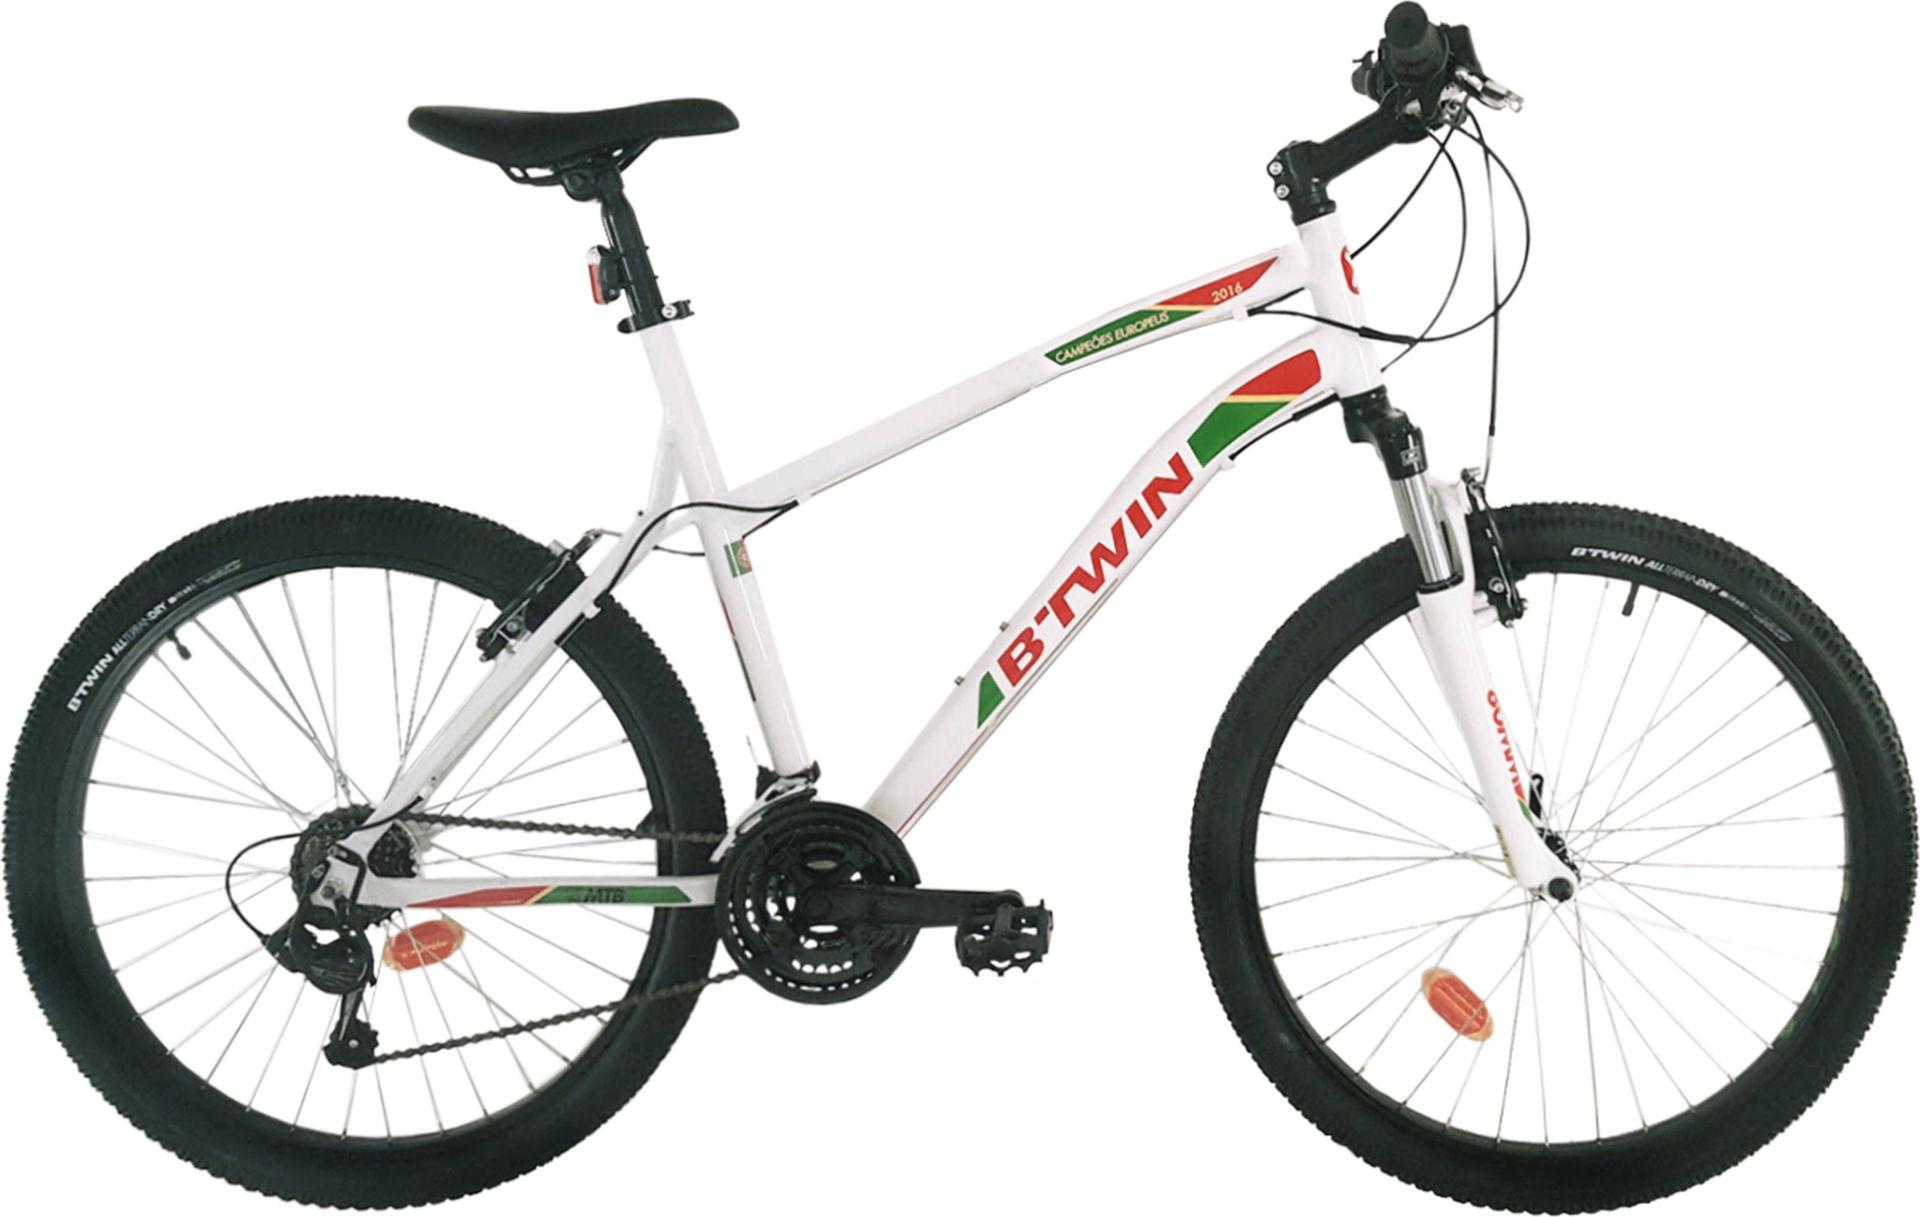 Btwin Rockrider 340 Portugal Mountain Bike 2017 Trail All